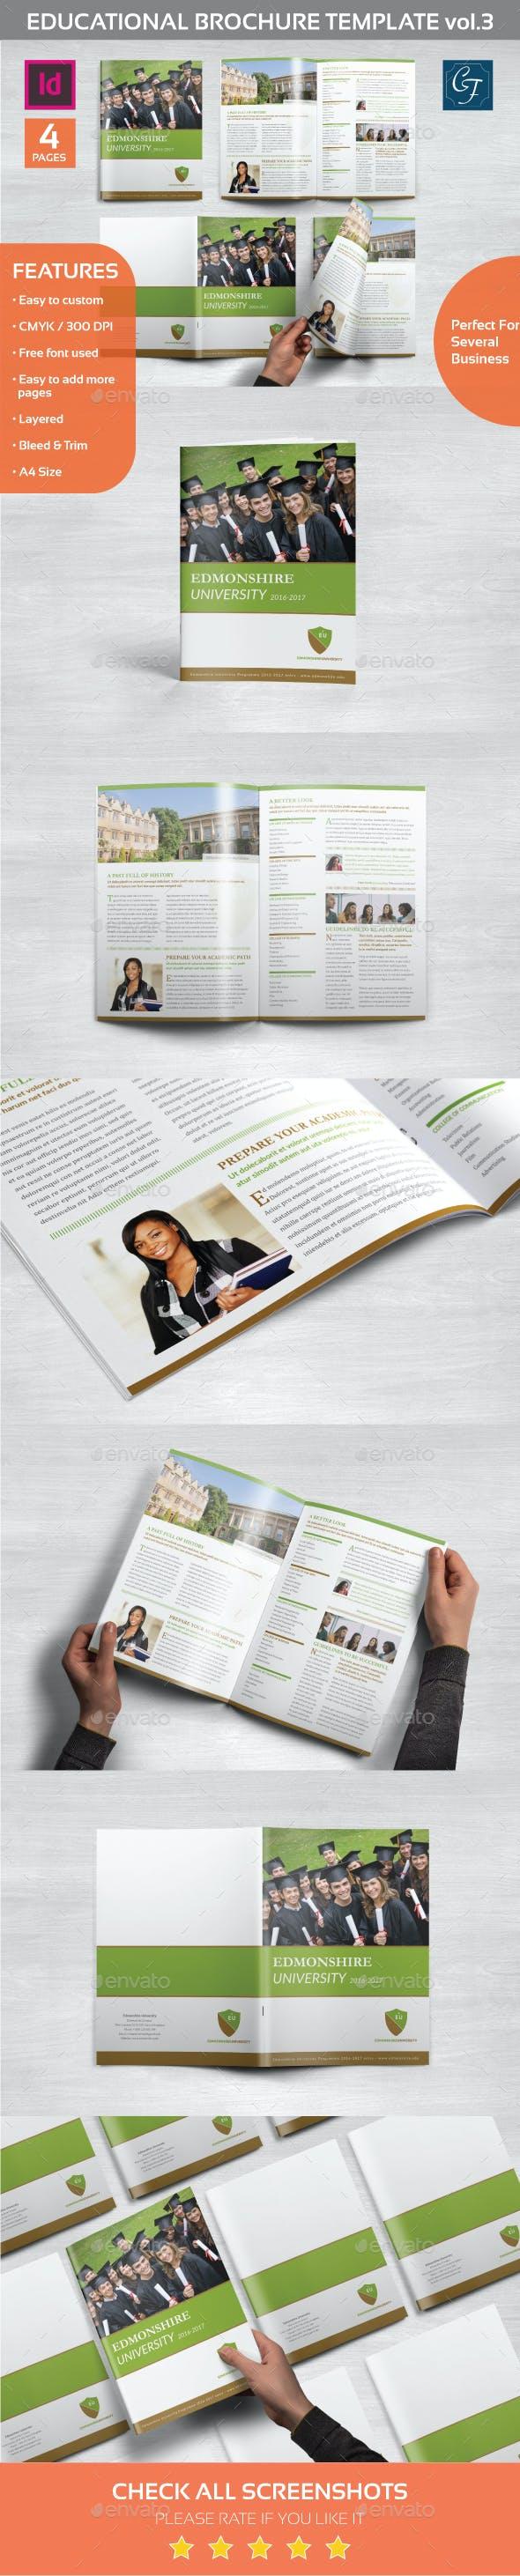 educational brochure template vol 3 by carlos fernando graphicriver